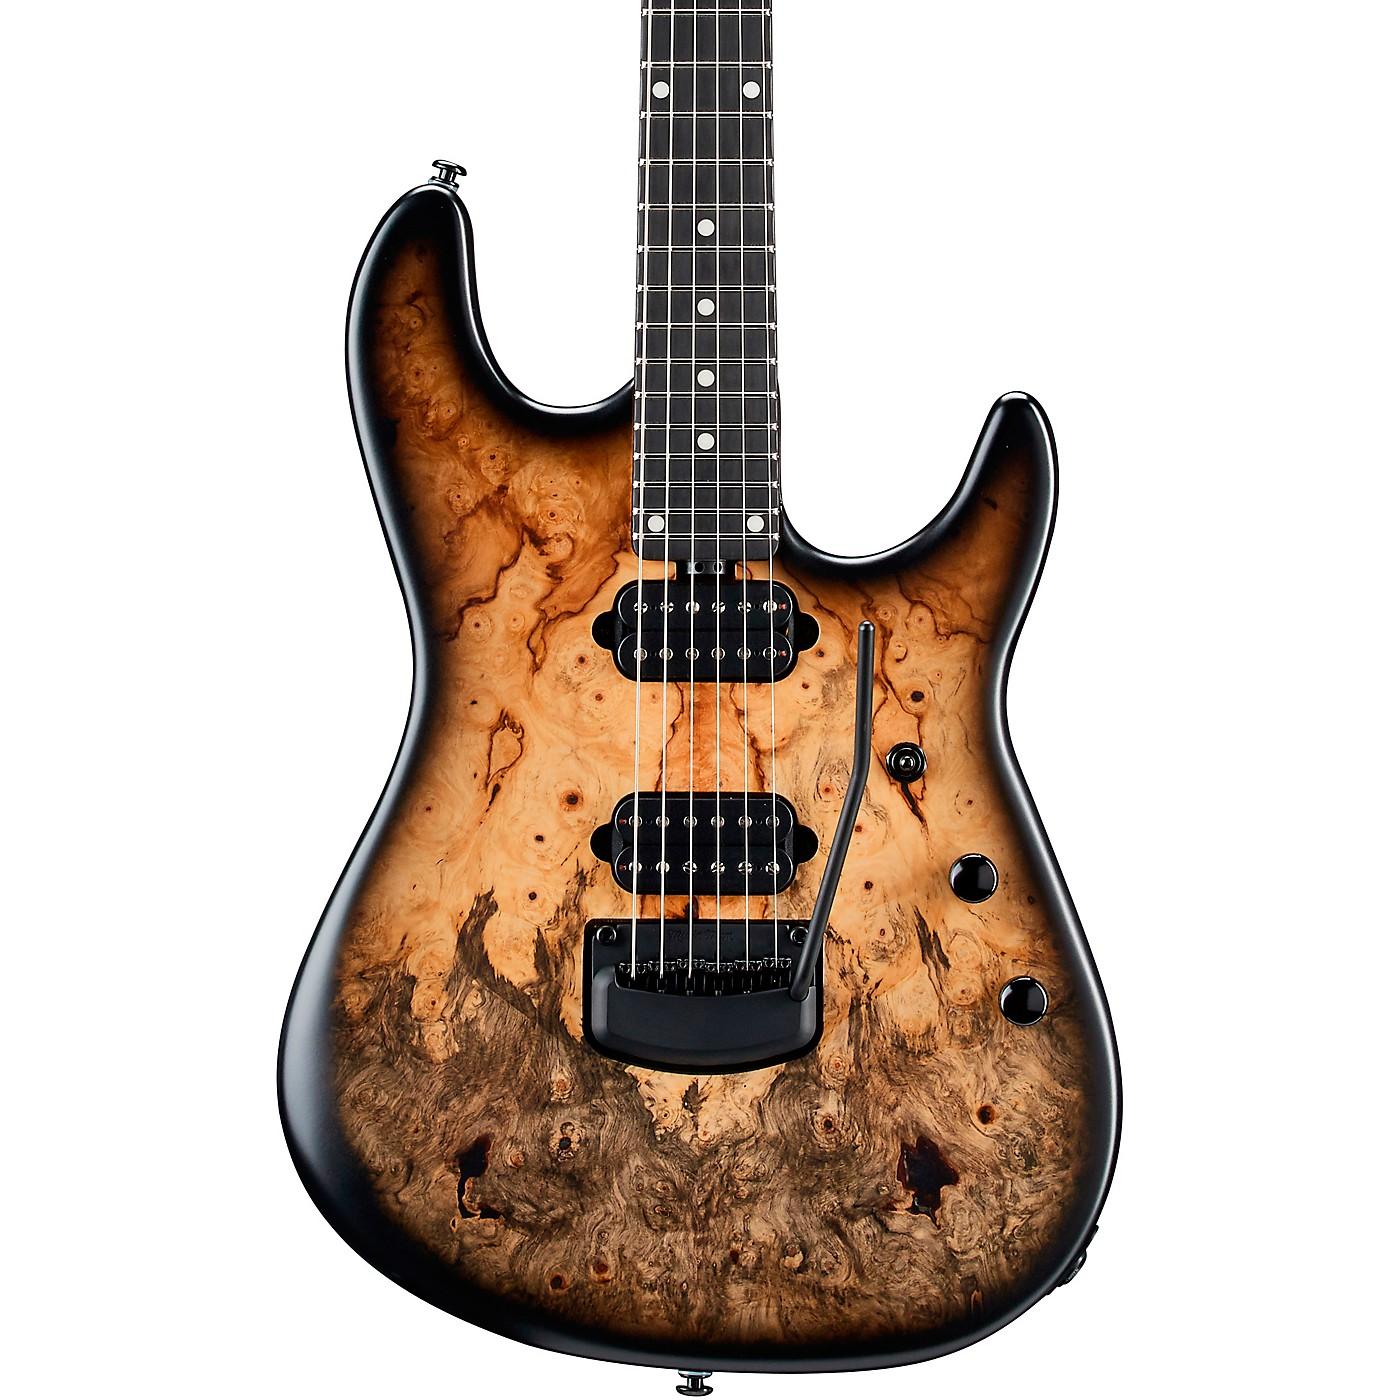 Ernie Ball Music Man Jason Richardson 6 String Electric Guitar with Black Hardware thumbnail